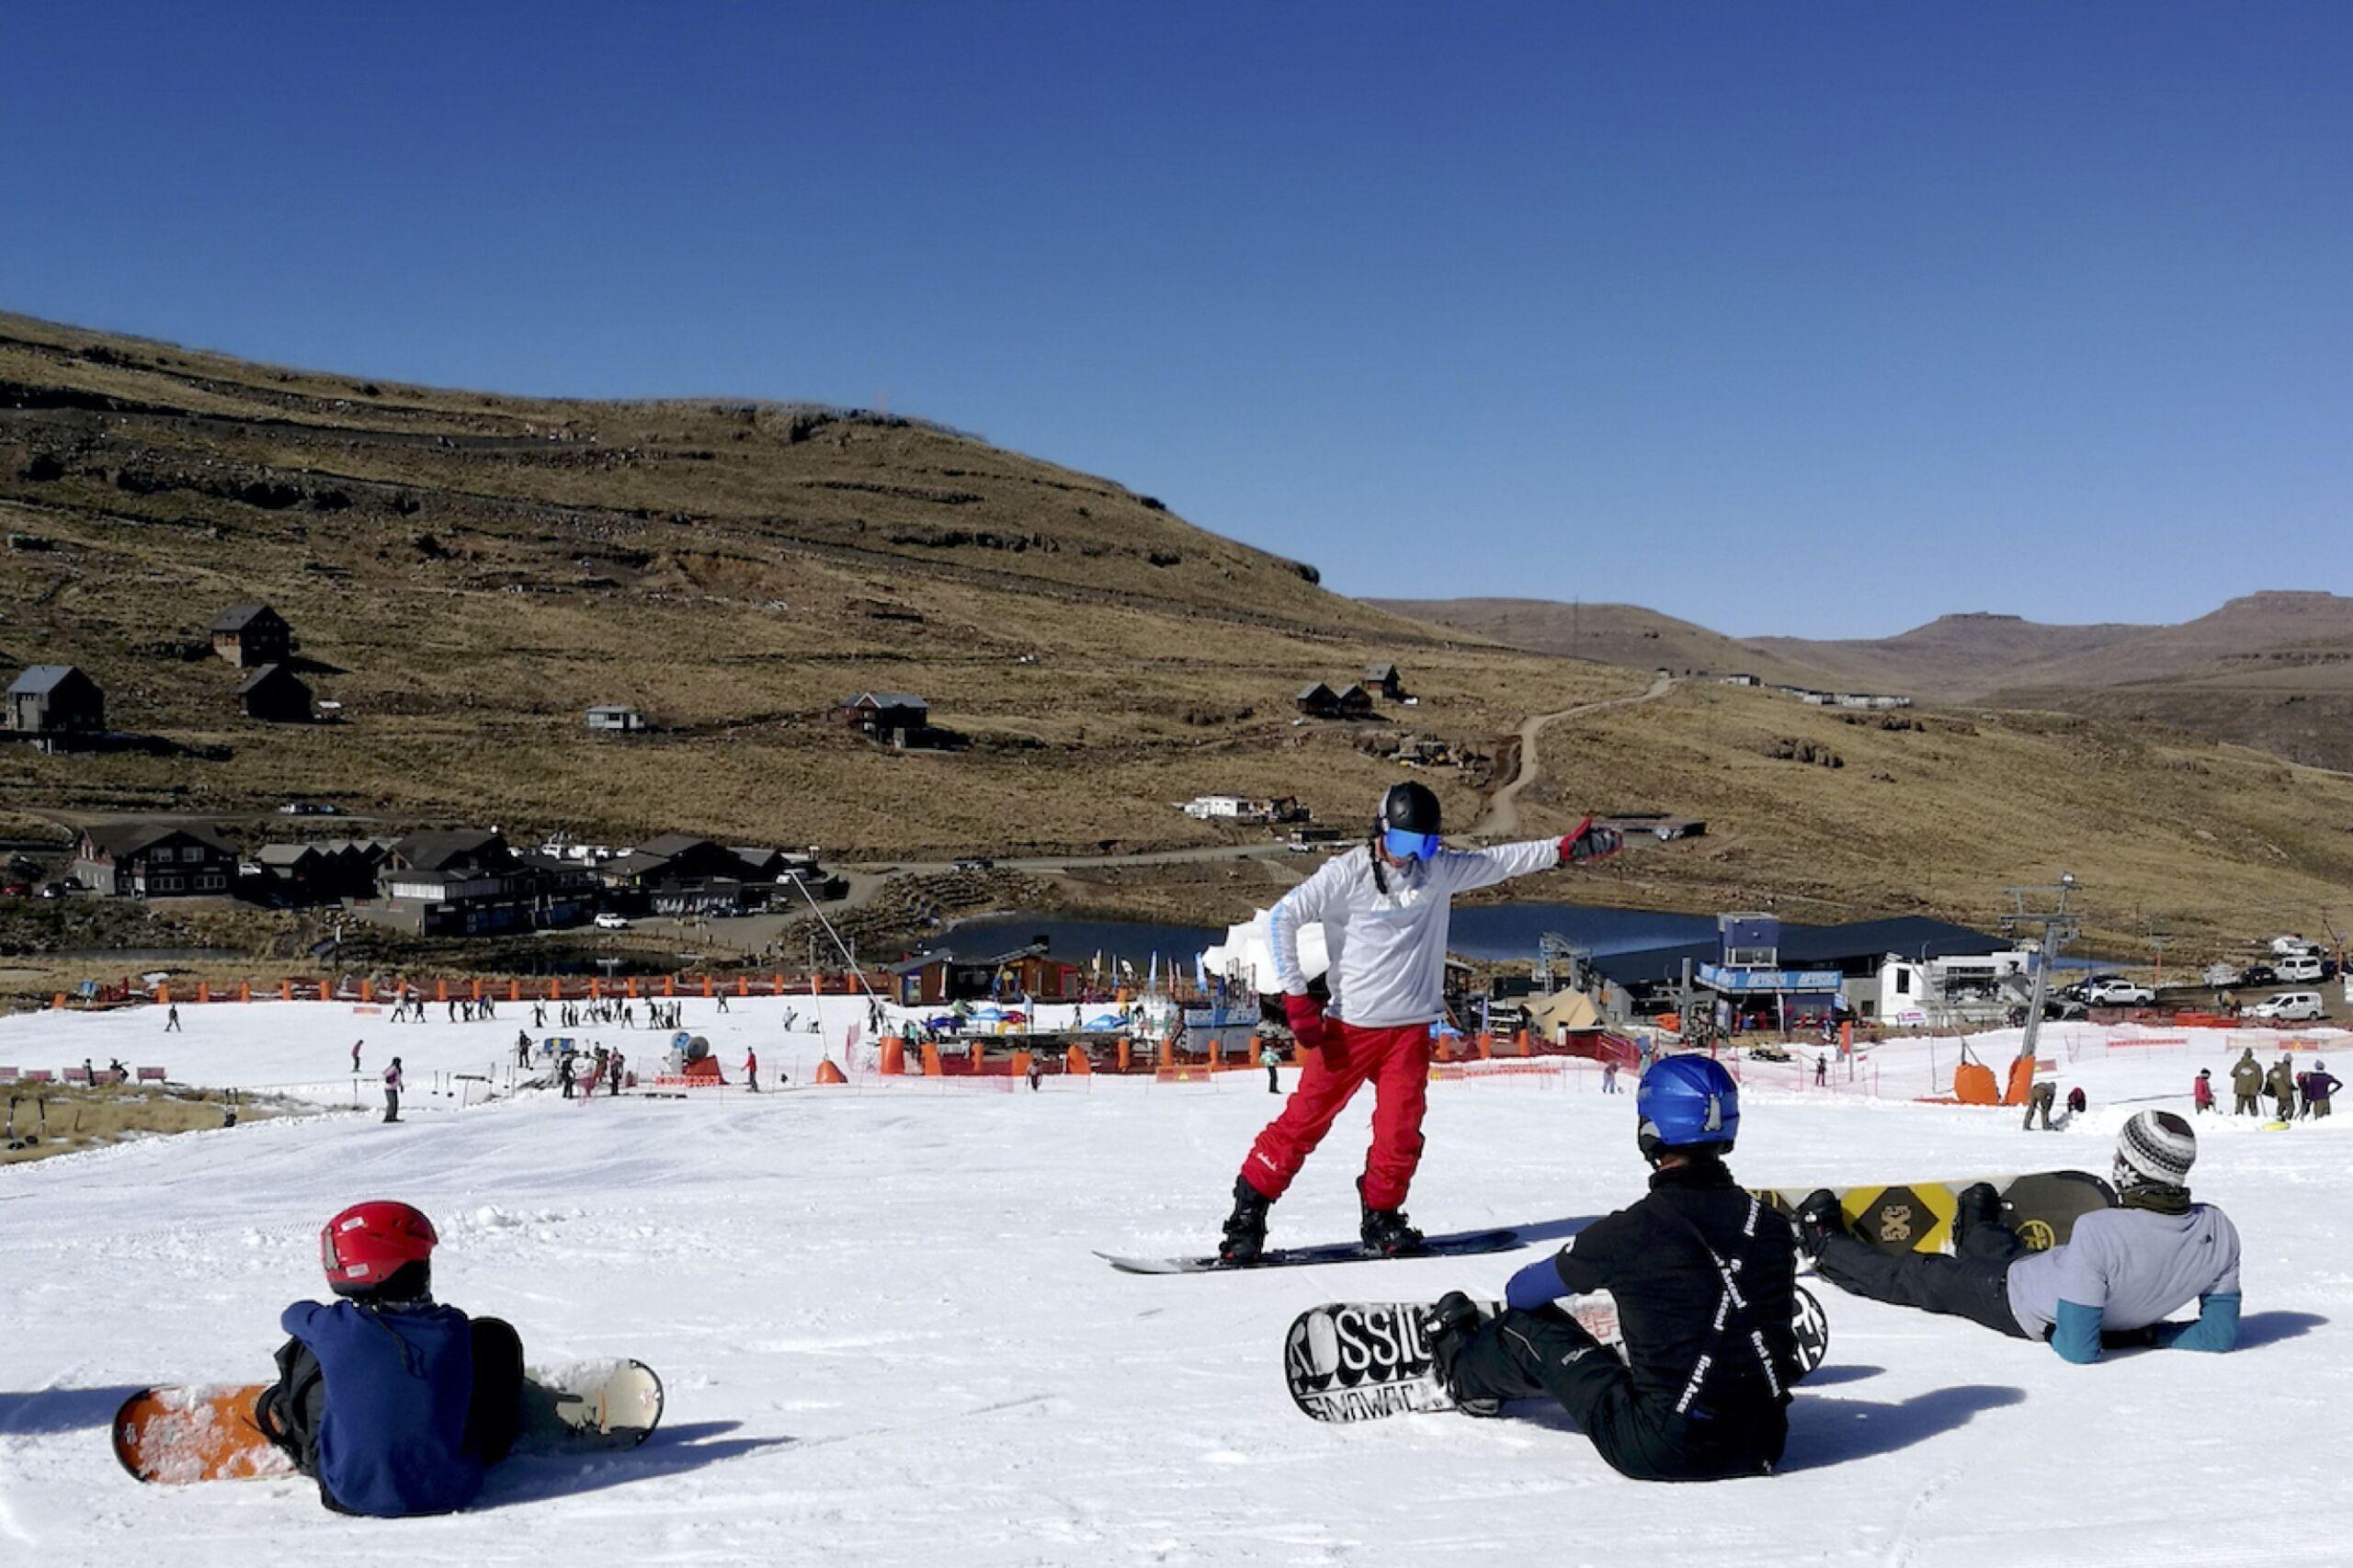 snowboarders at afriski